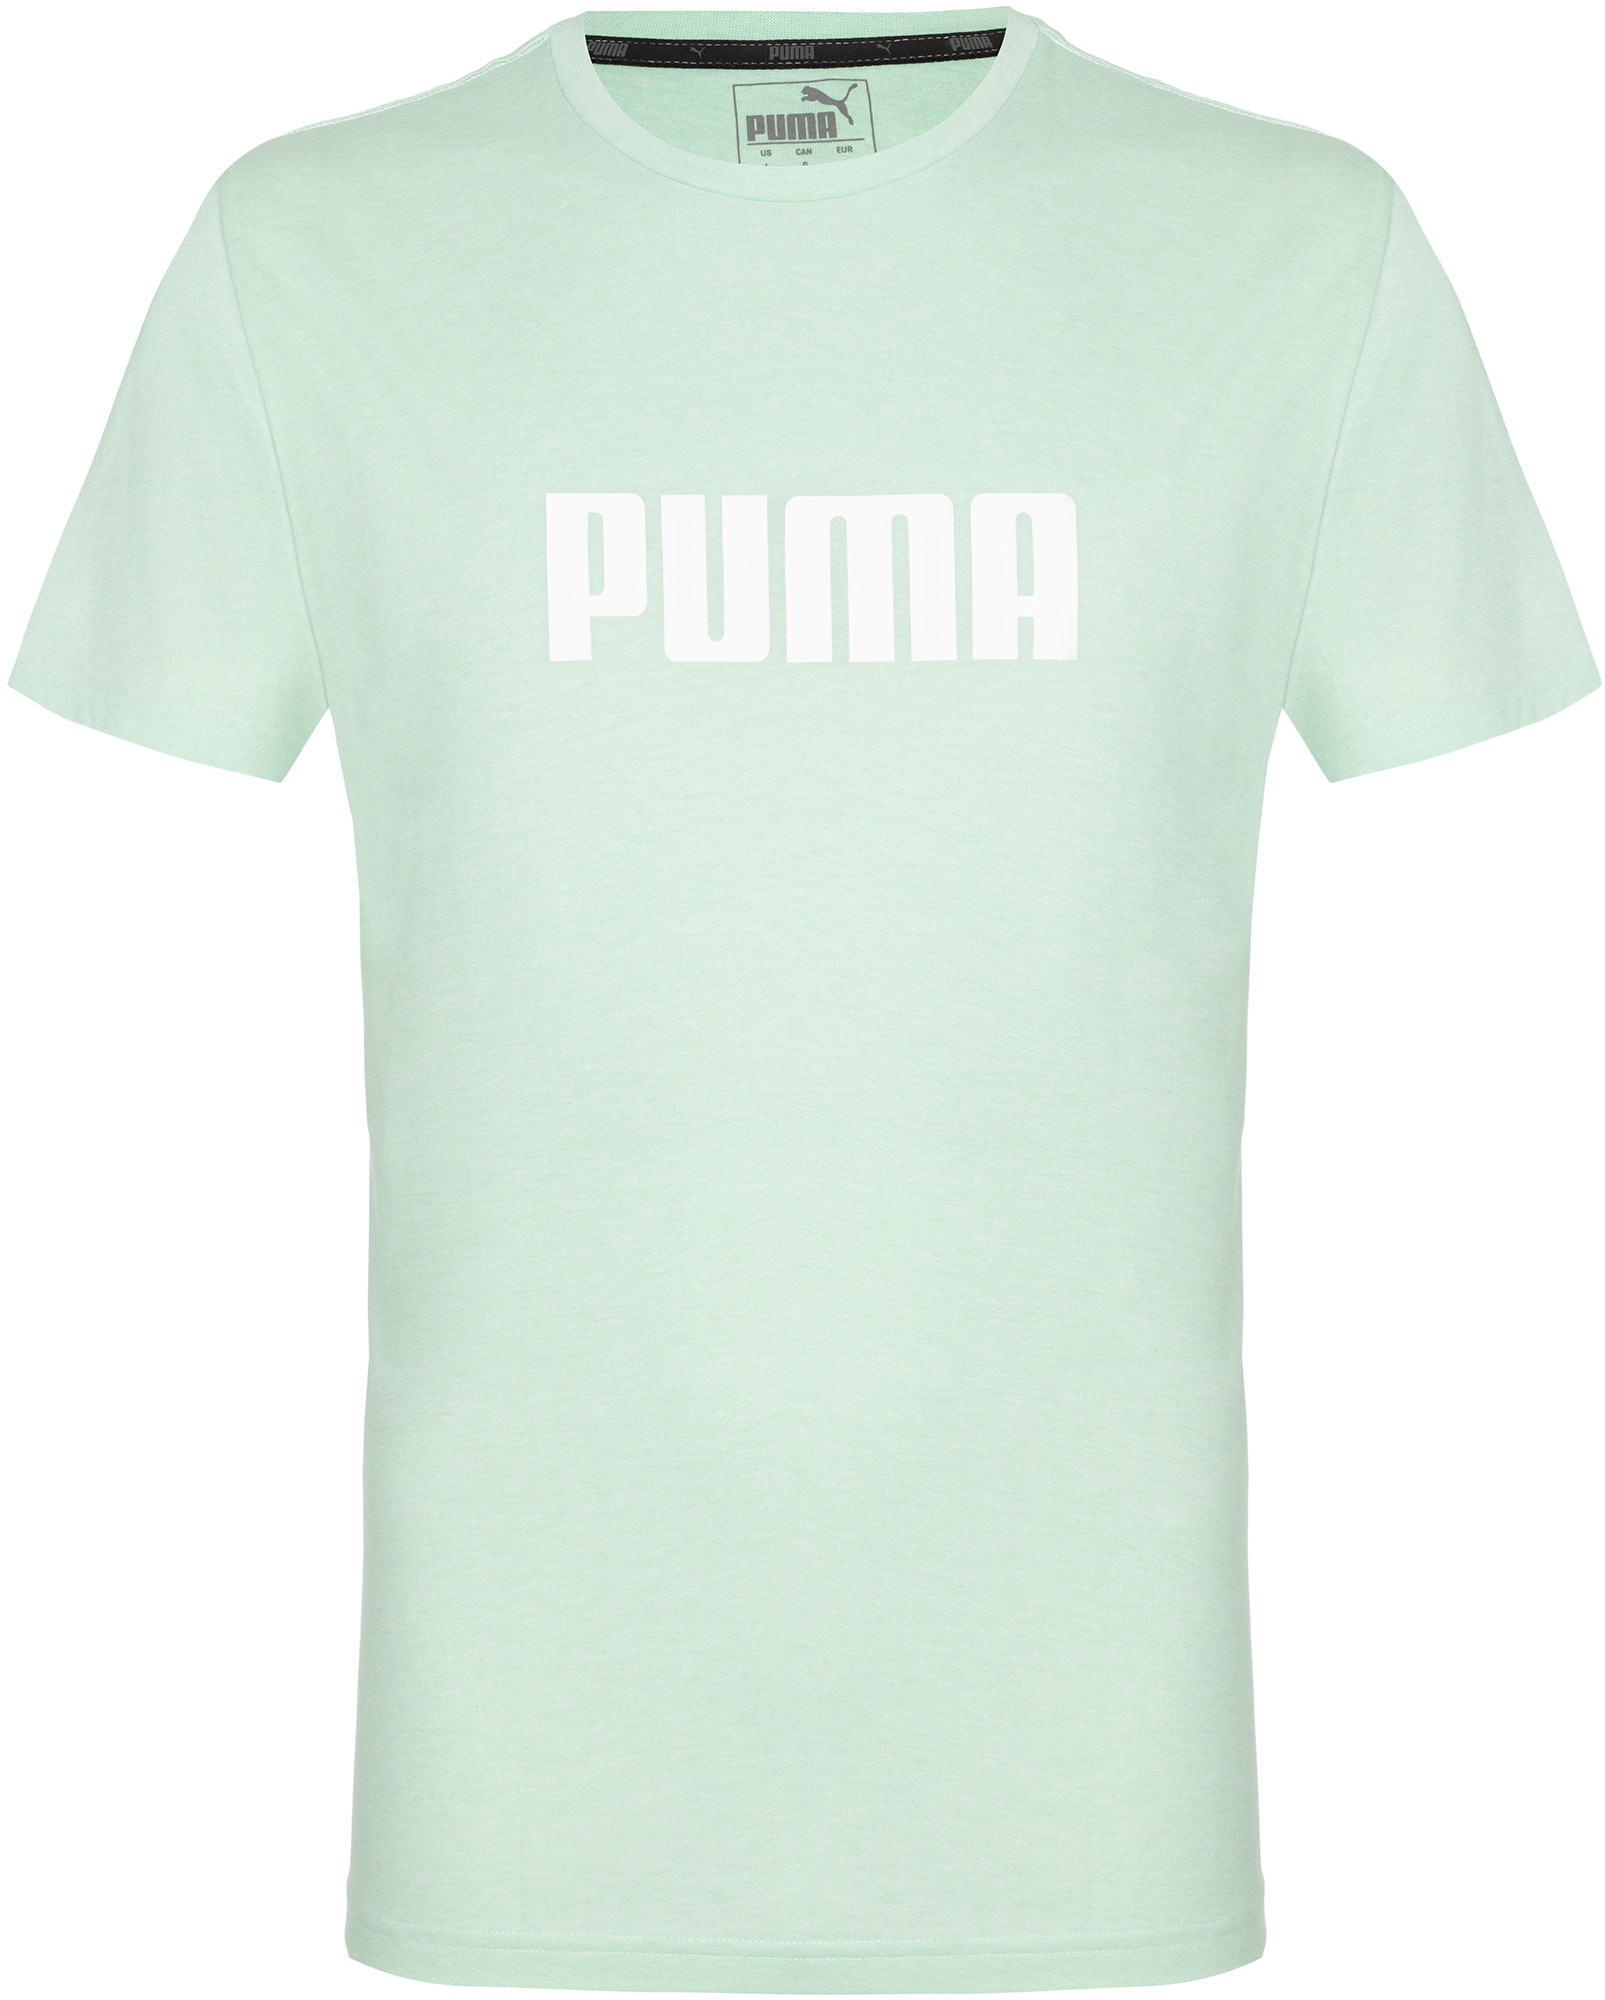 Puma Футболка мужская Puma ESS+ Heather Tee, размер 52-54 футболка женская puma ess no 1 tee heather w цвет синий 83839920 размер s 42 44